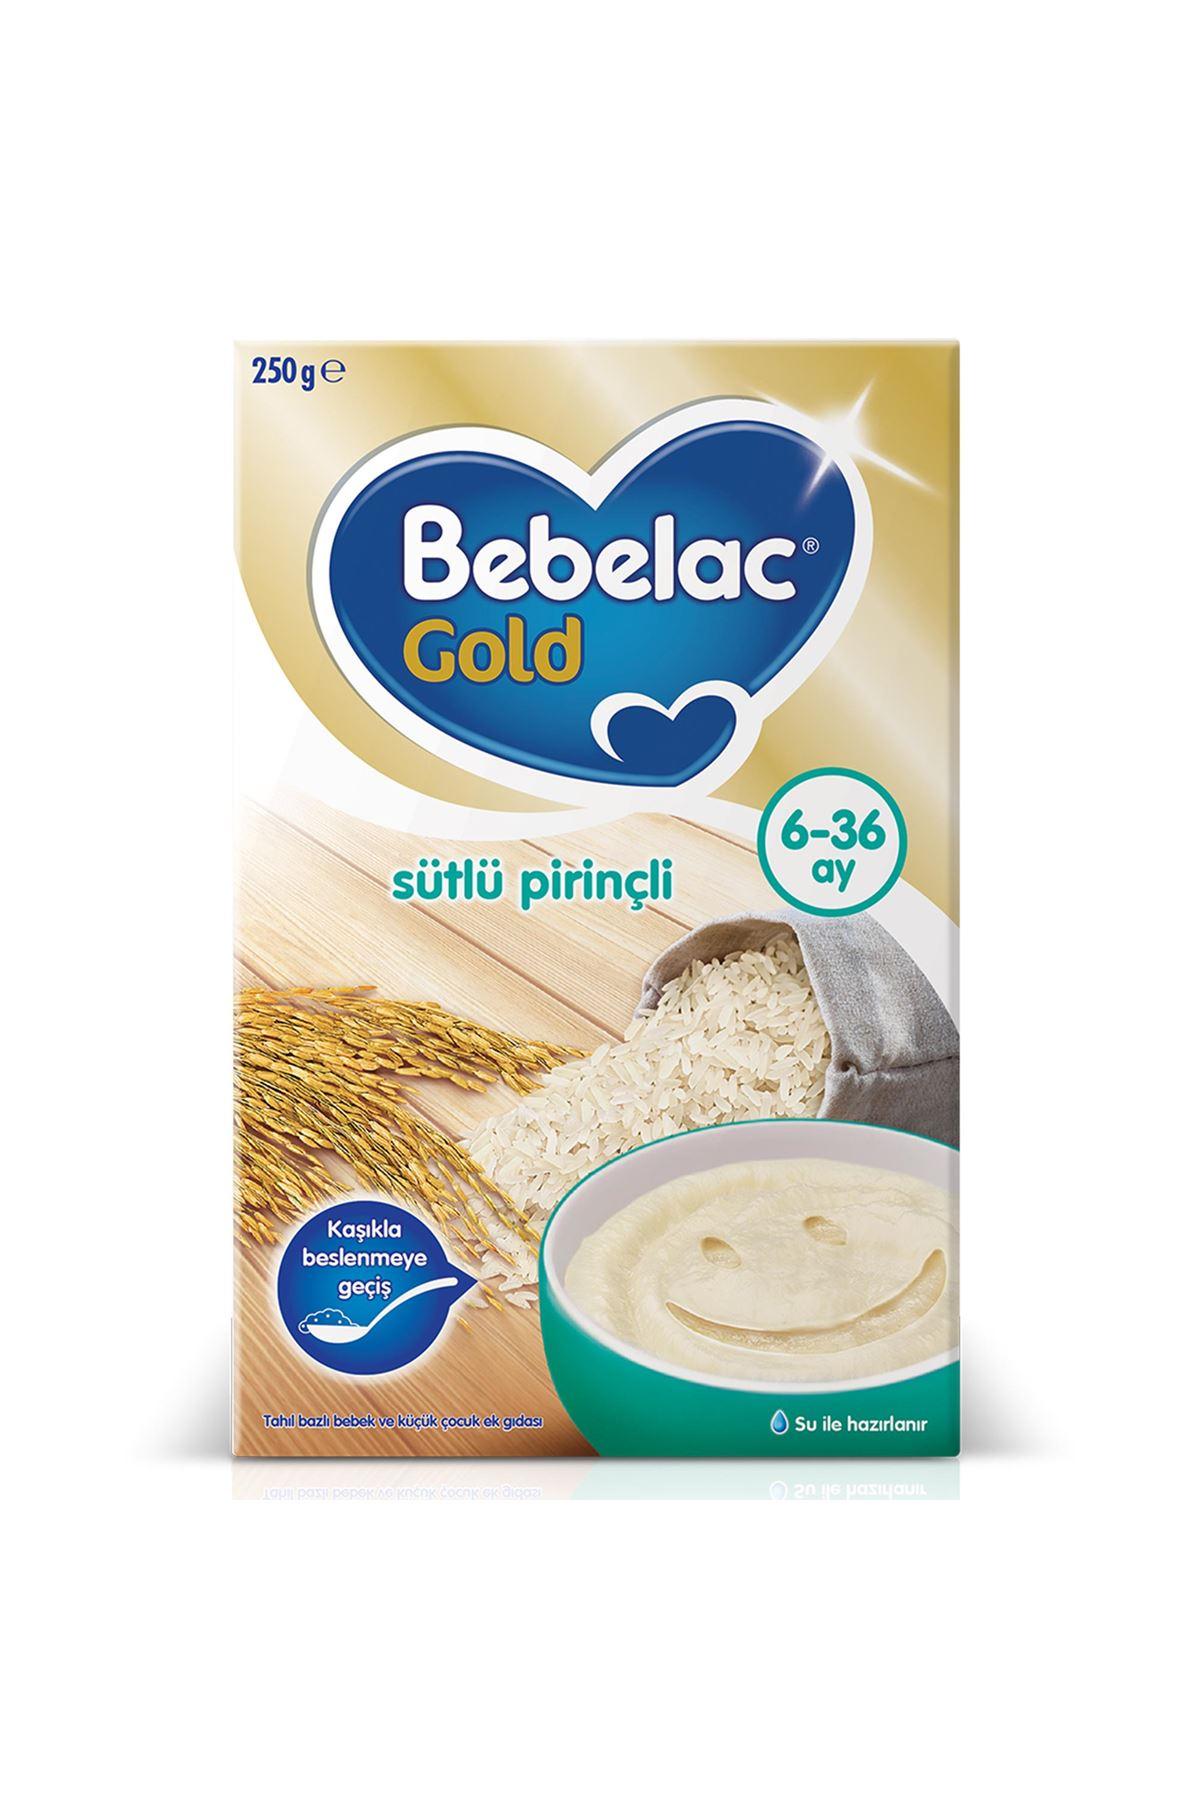 Bebelac Gold Sütlü Pirinçli Kaşık Maması 250 Gr